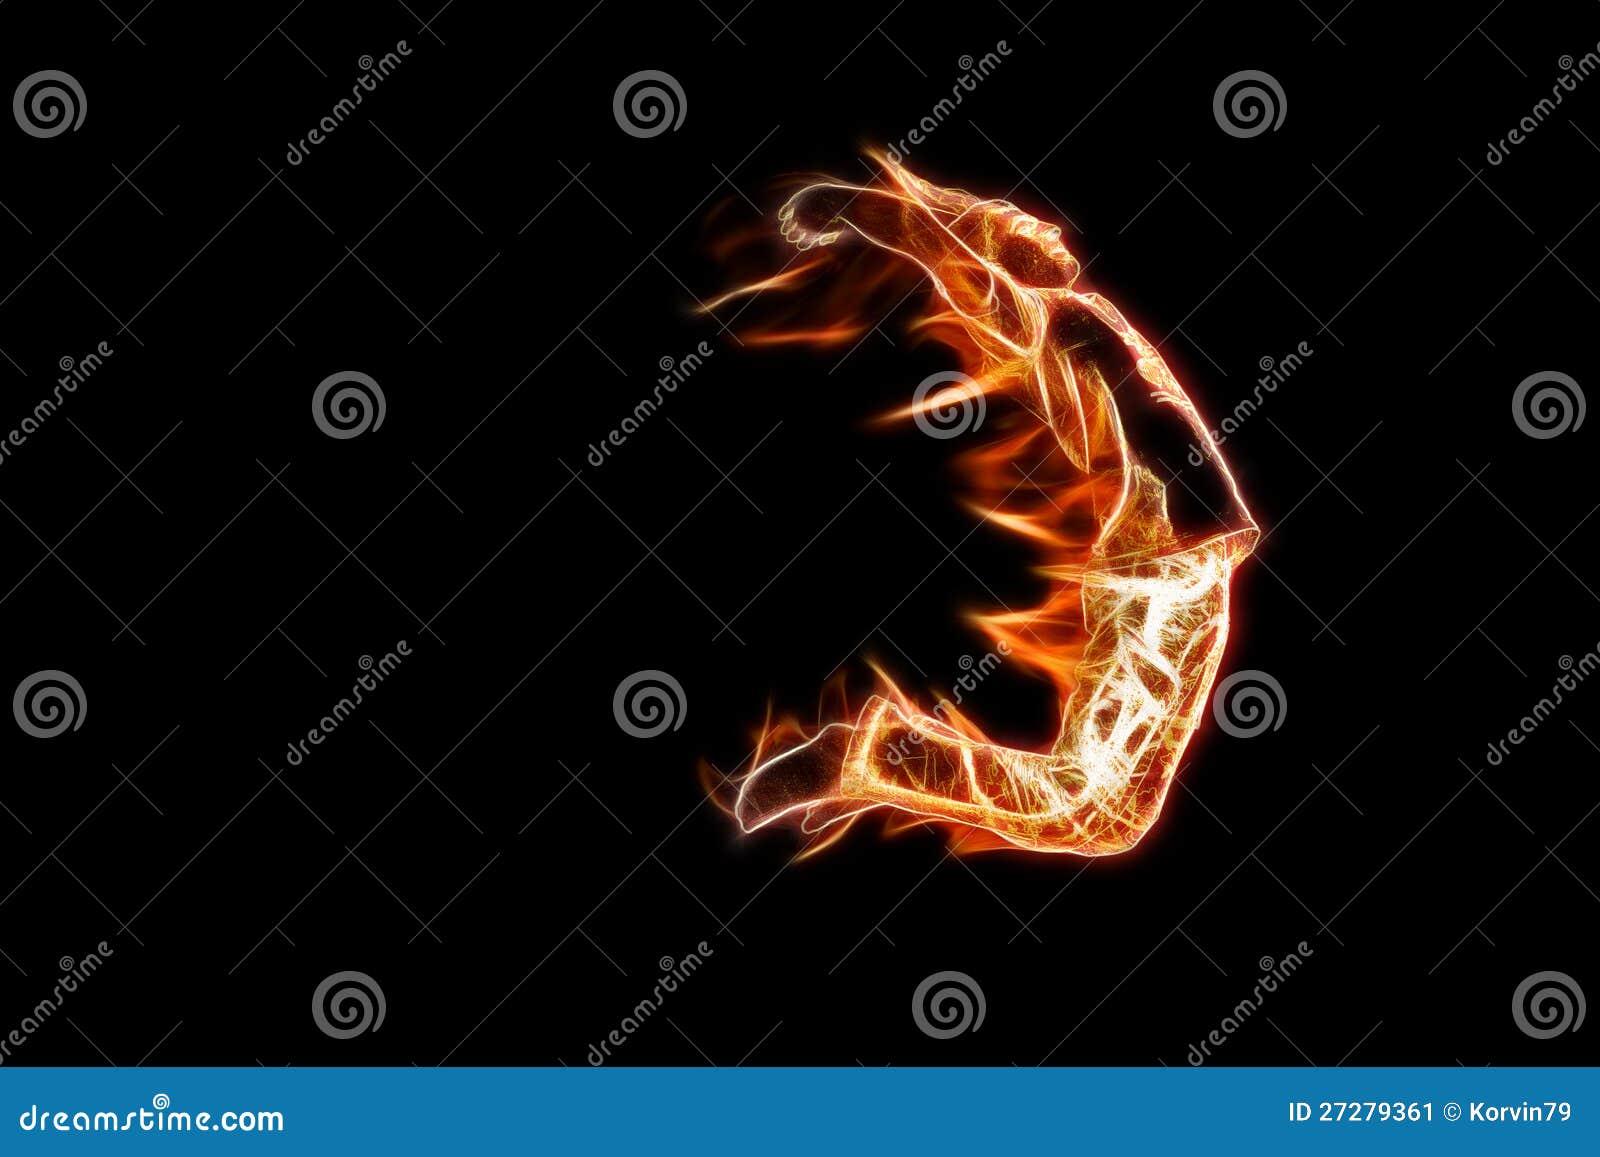 brennender mann stockbild bild von hei feuer junge 27279361. Black Bedroom Furniture Sets. Home Design Ideas